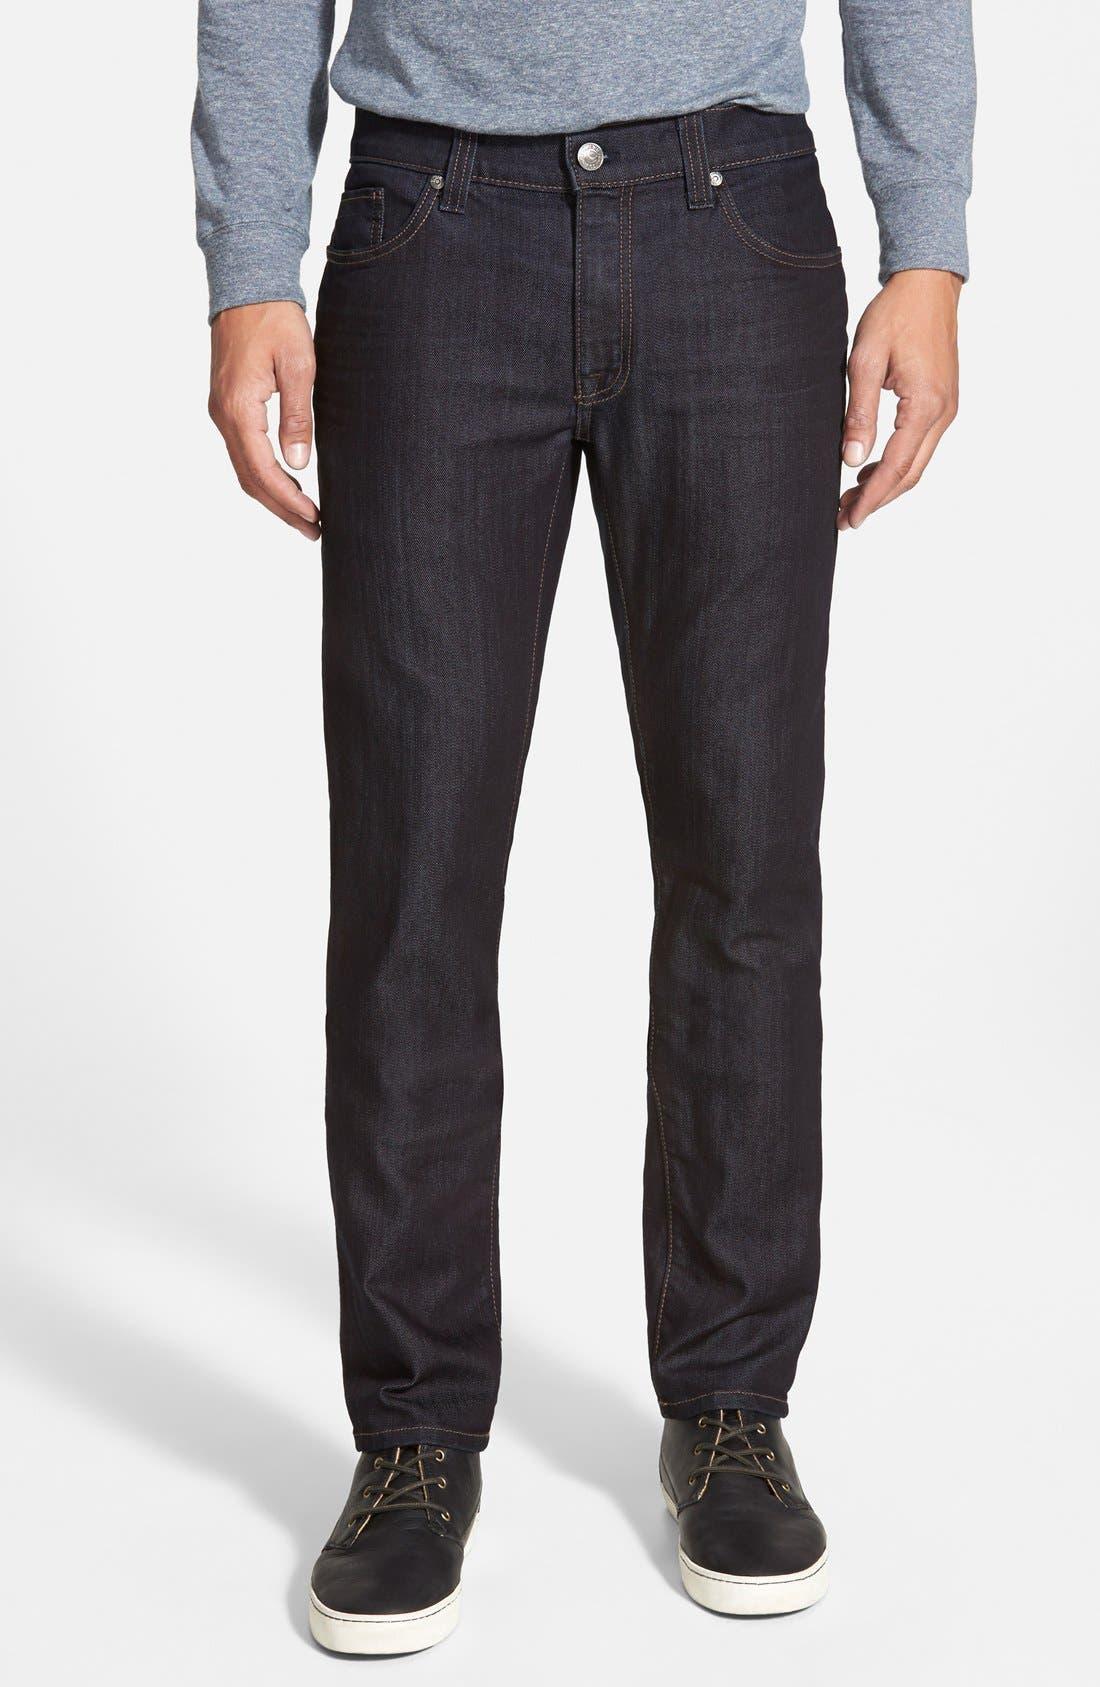 Torino Slim Fit Jeans,                         Main,                         color, Revolution Rinse